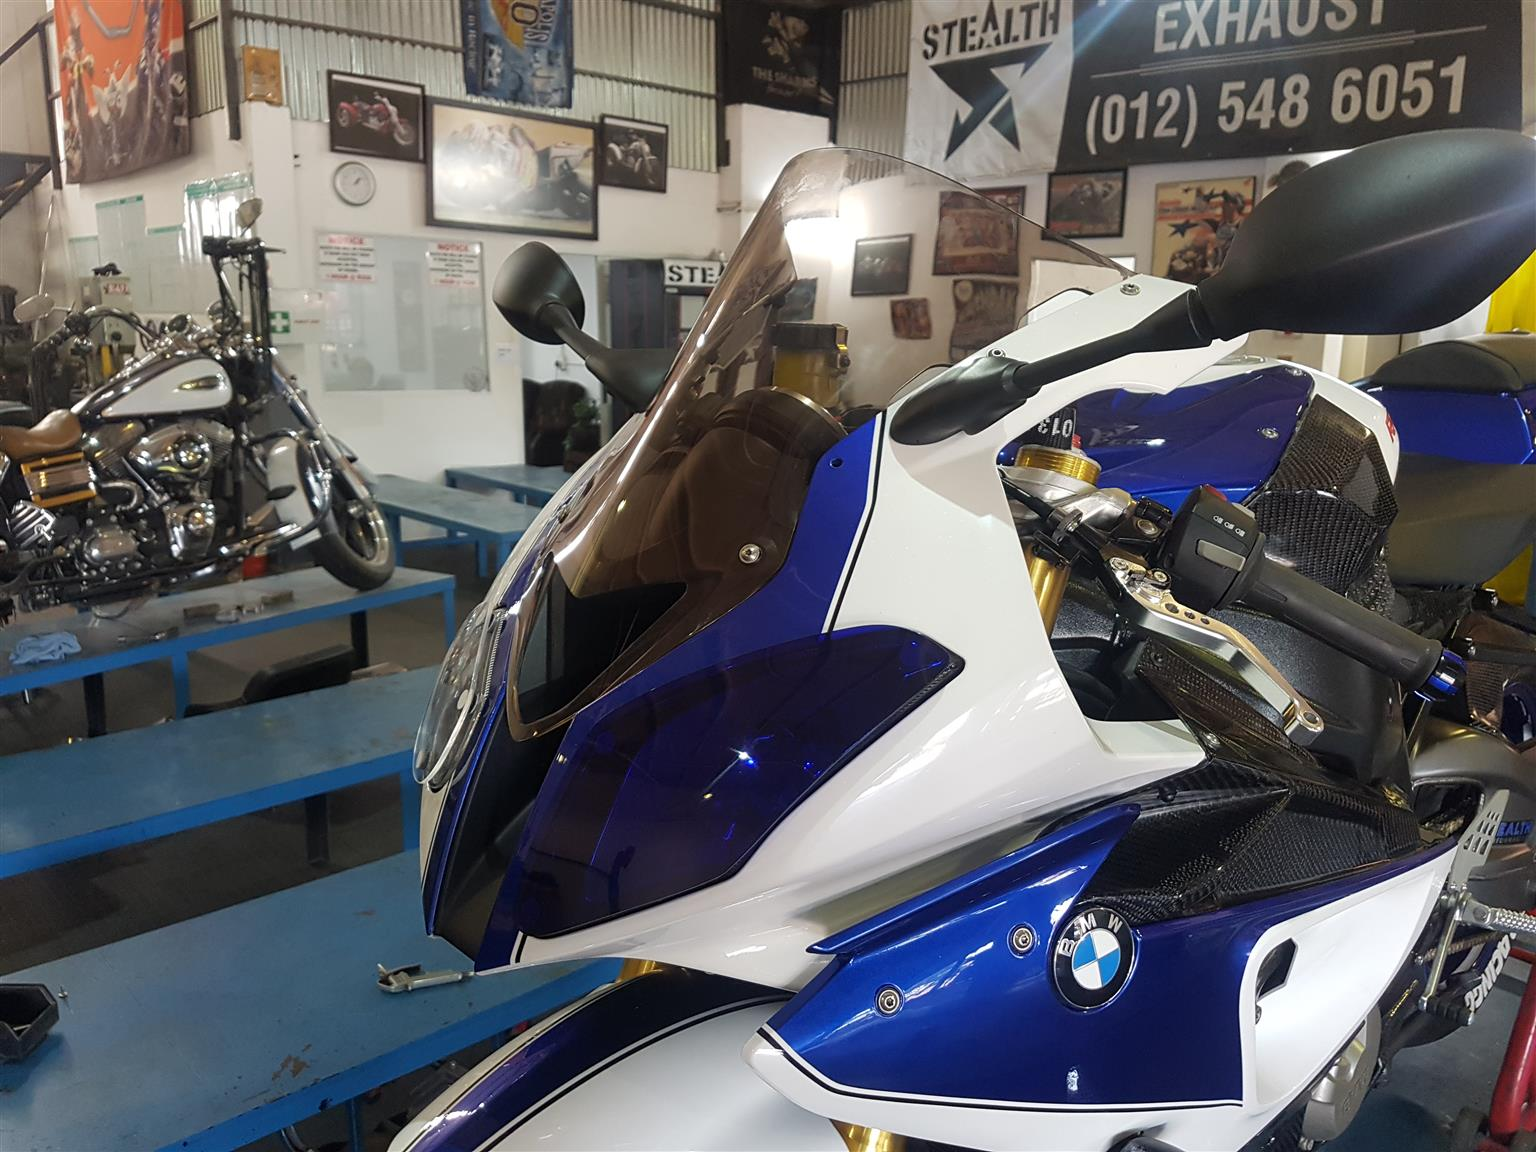 War Eagle Racing Motorcycle Screens and Fairings BMW S1000RR 2012 D/B Screen